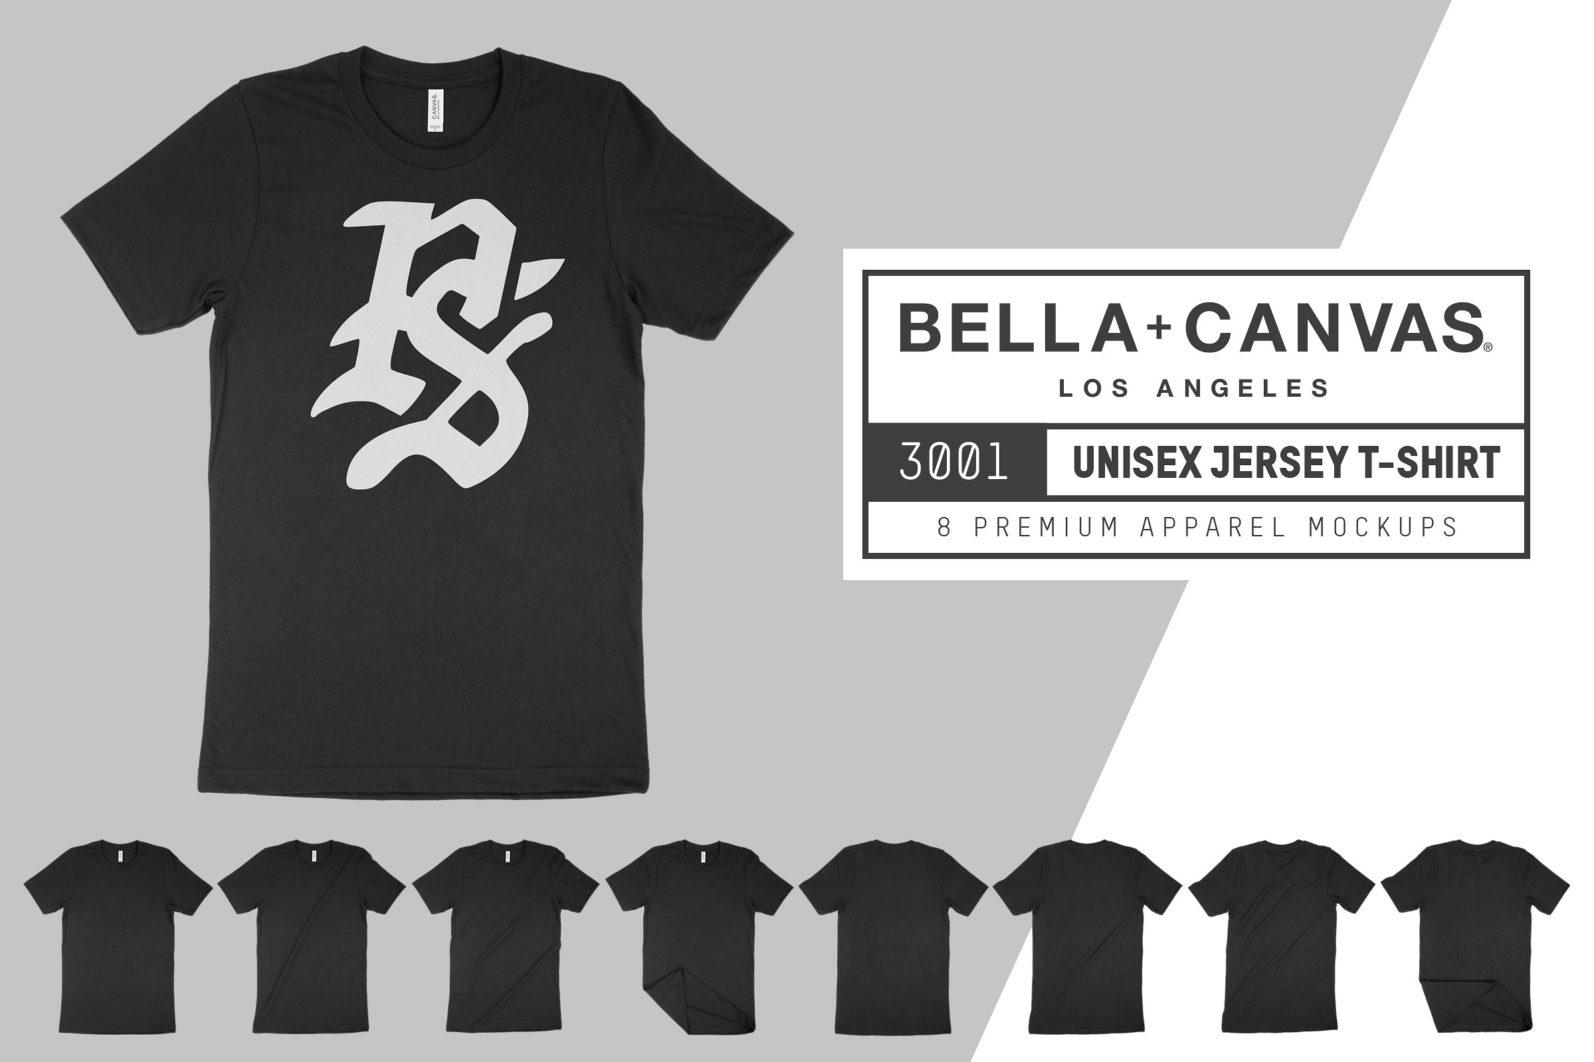 Bella Canvas 3001 T-Shirt Mockups - ps bc 3001 01 -